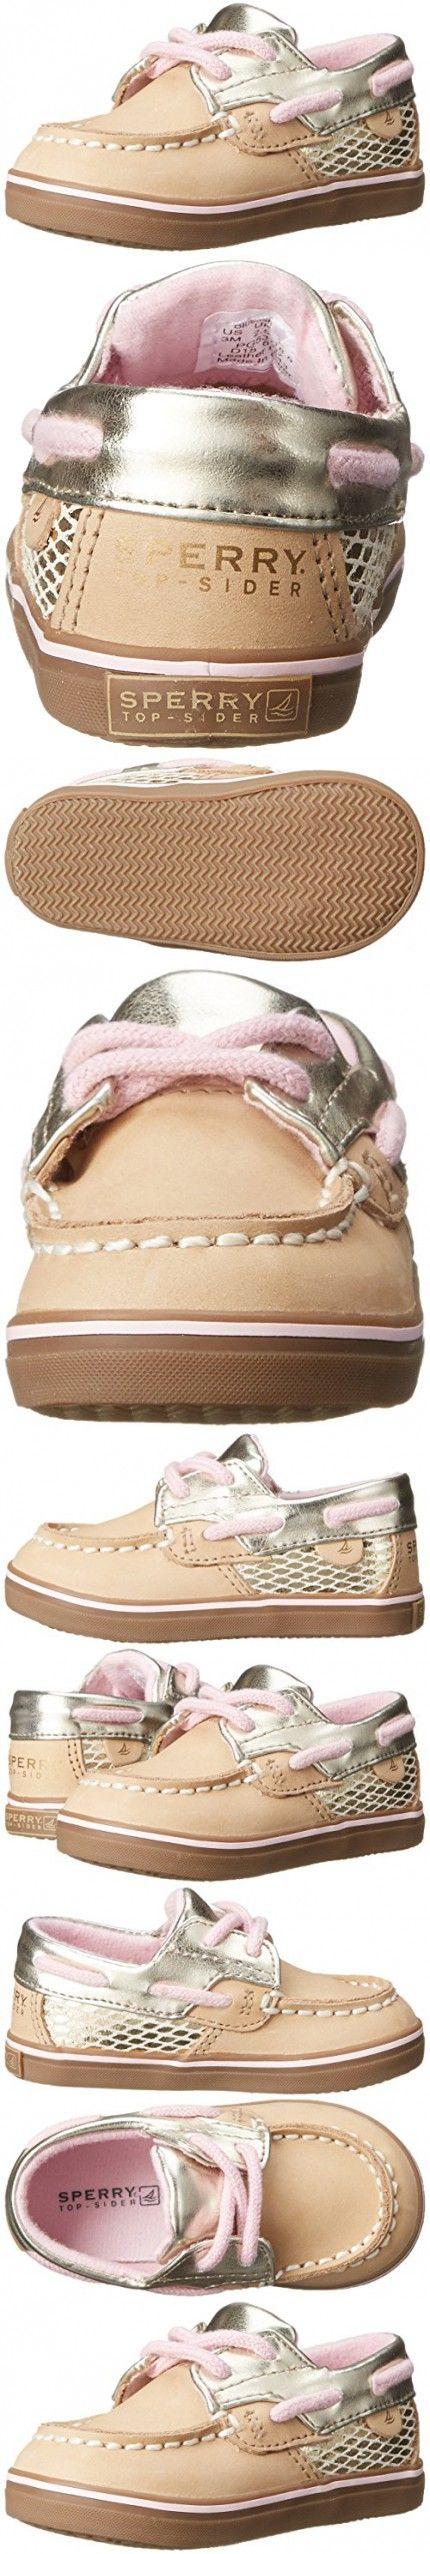 Sperry Bluefish Crib Boat Shoe (Infant/Toddler), Silver Cloud, 3 M US Infant